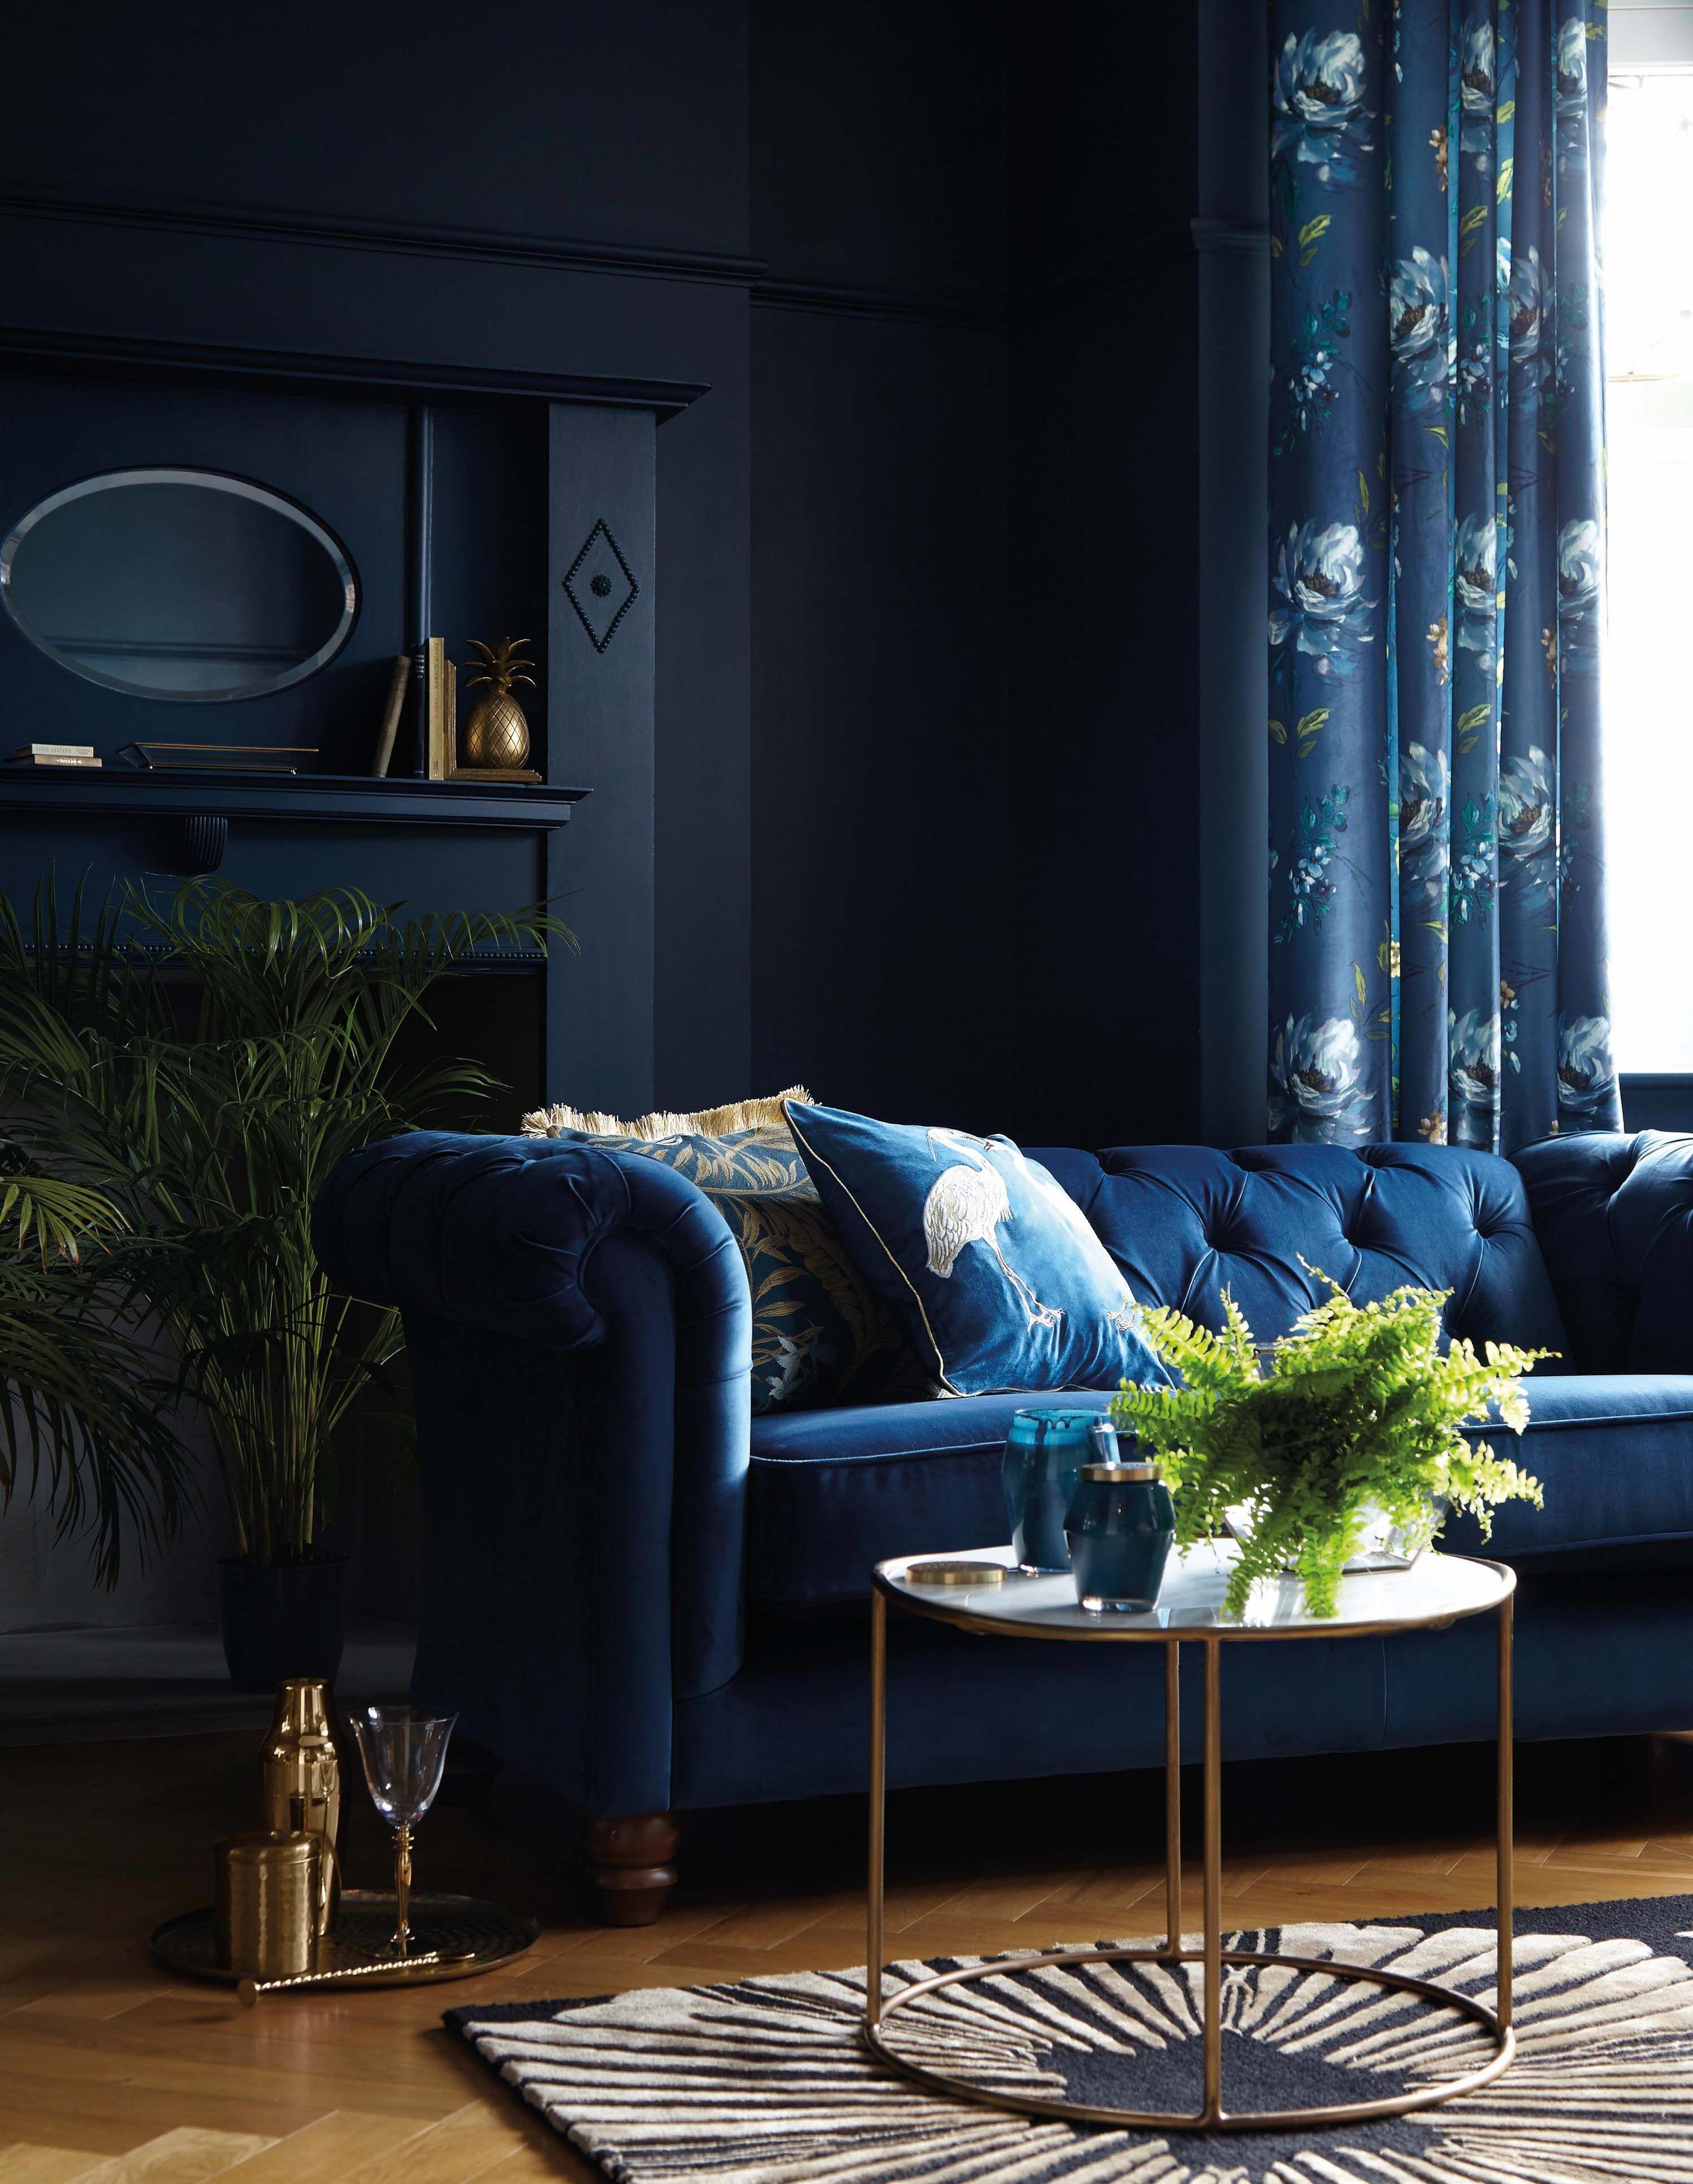 Navy Blue Velvet Sofa And Navy Walls In A Living Room Couchlivingroom Blue Living Room Decor Blue Sofas Living Room Navy Blue Living Room